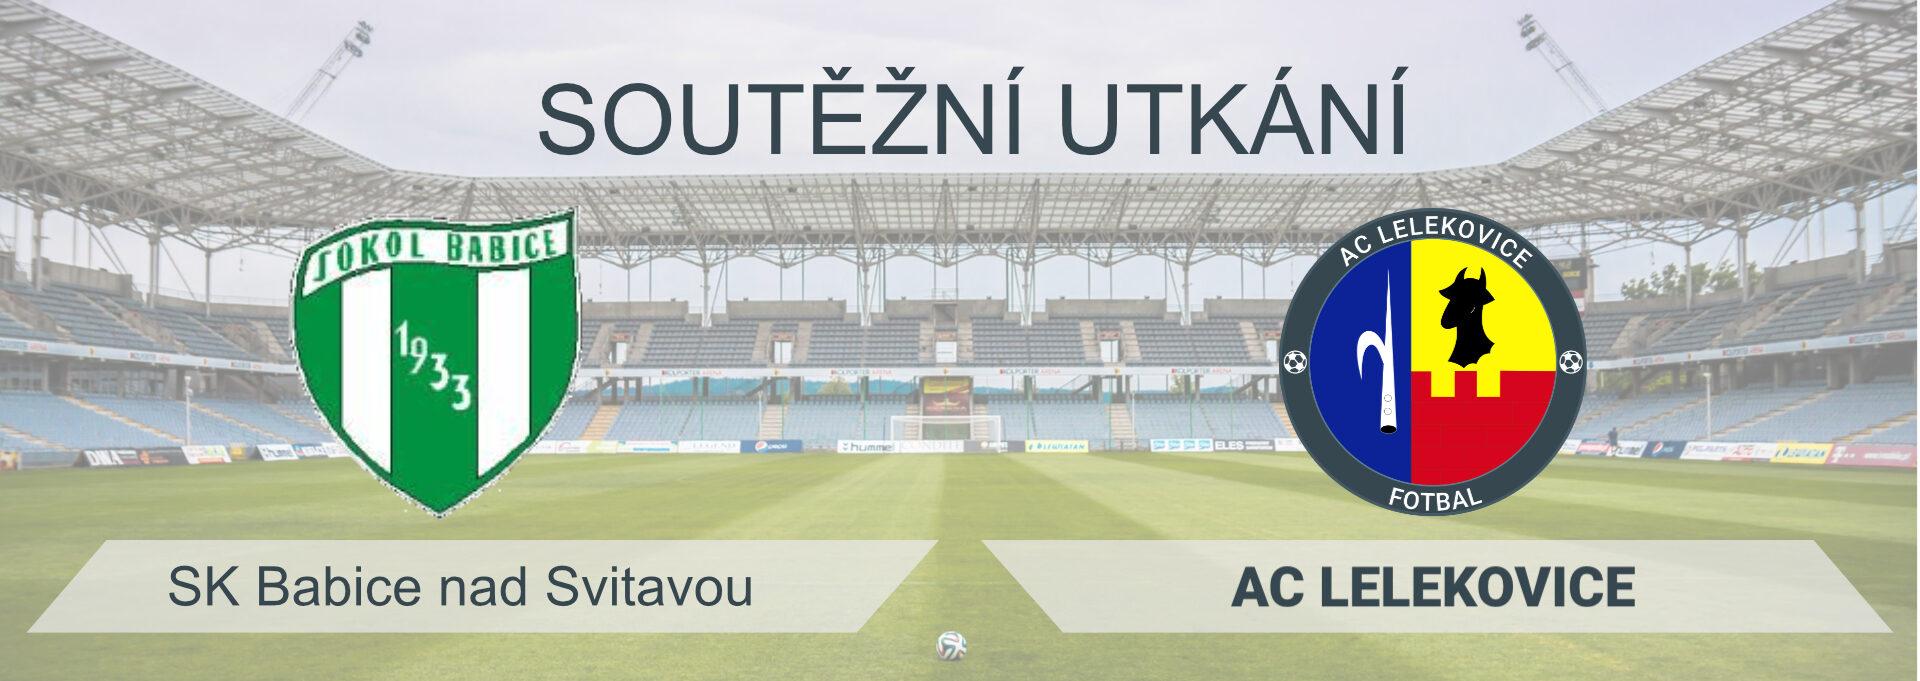 AC LELEKOVICE fotbalový klub